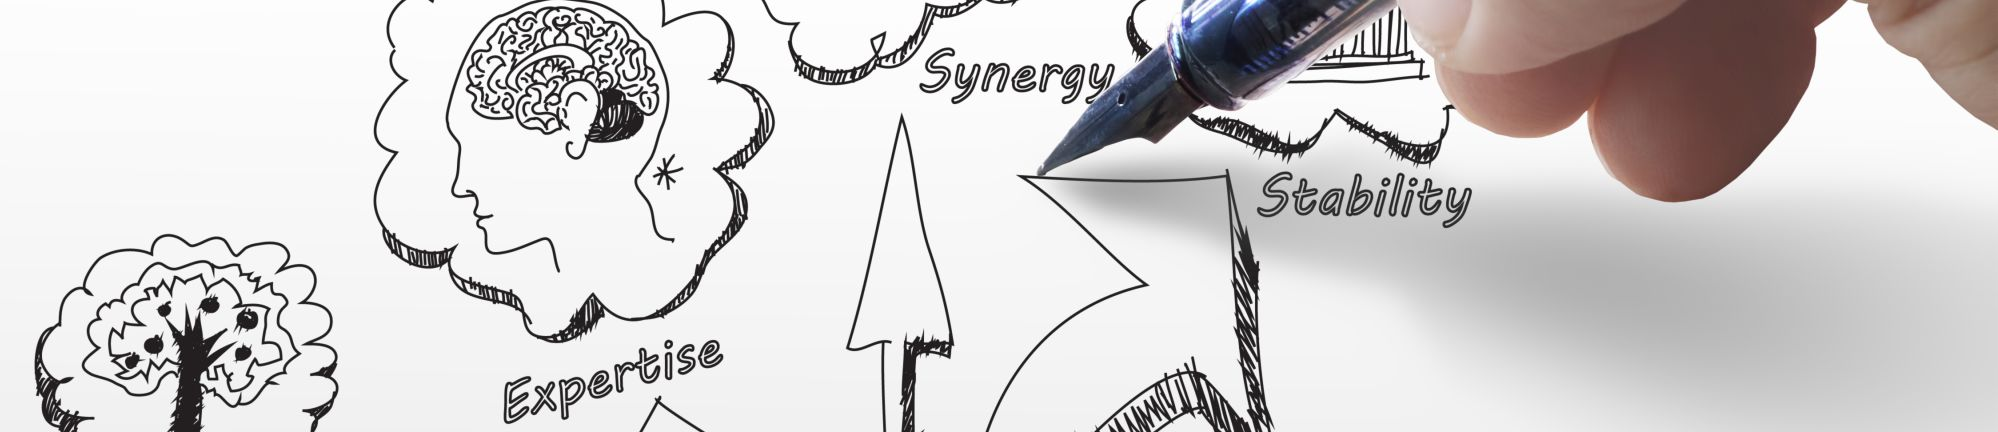 PR is Synergy